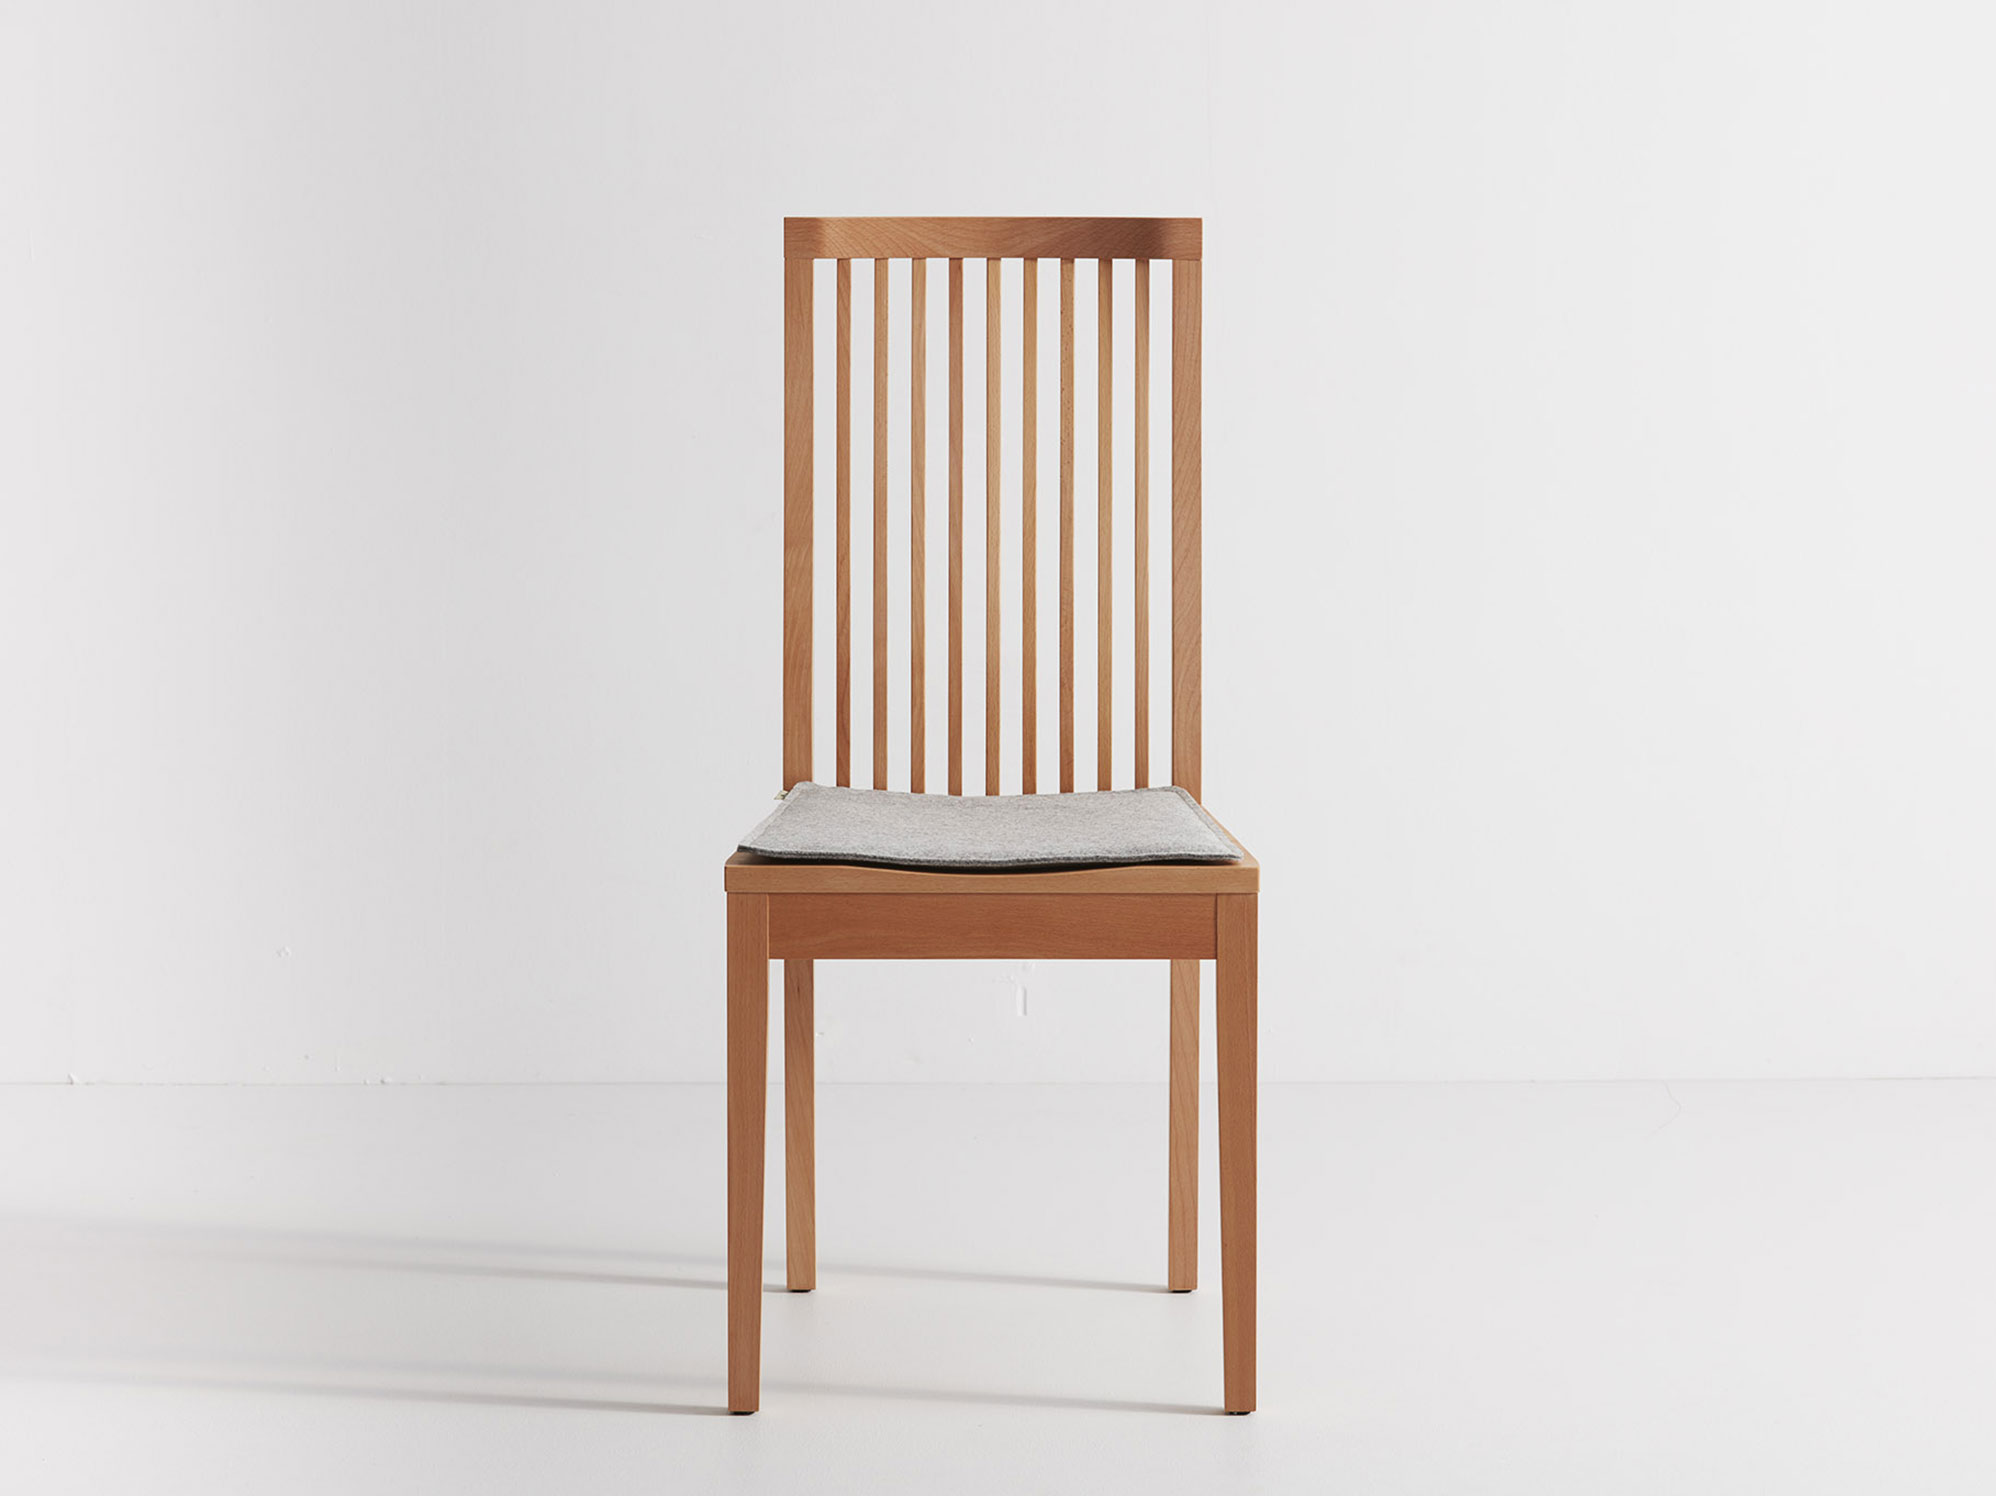 stuhlauflage f r stuhl achill 100 schafschurwoll filz. Black Bedroom Furniture Sets. Home Design Ideas